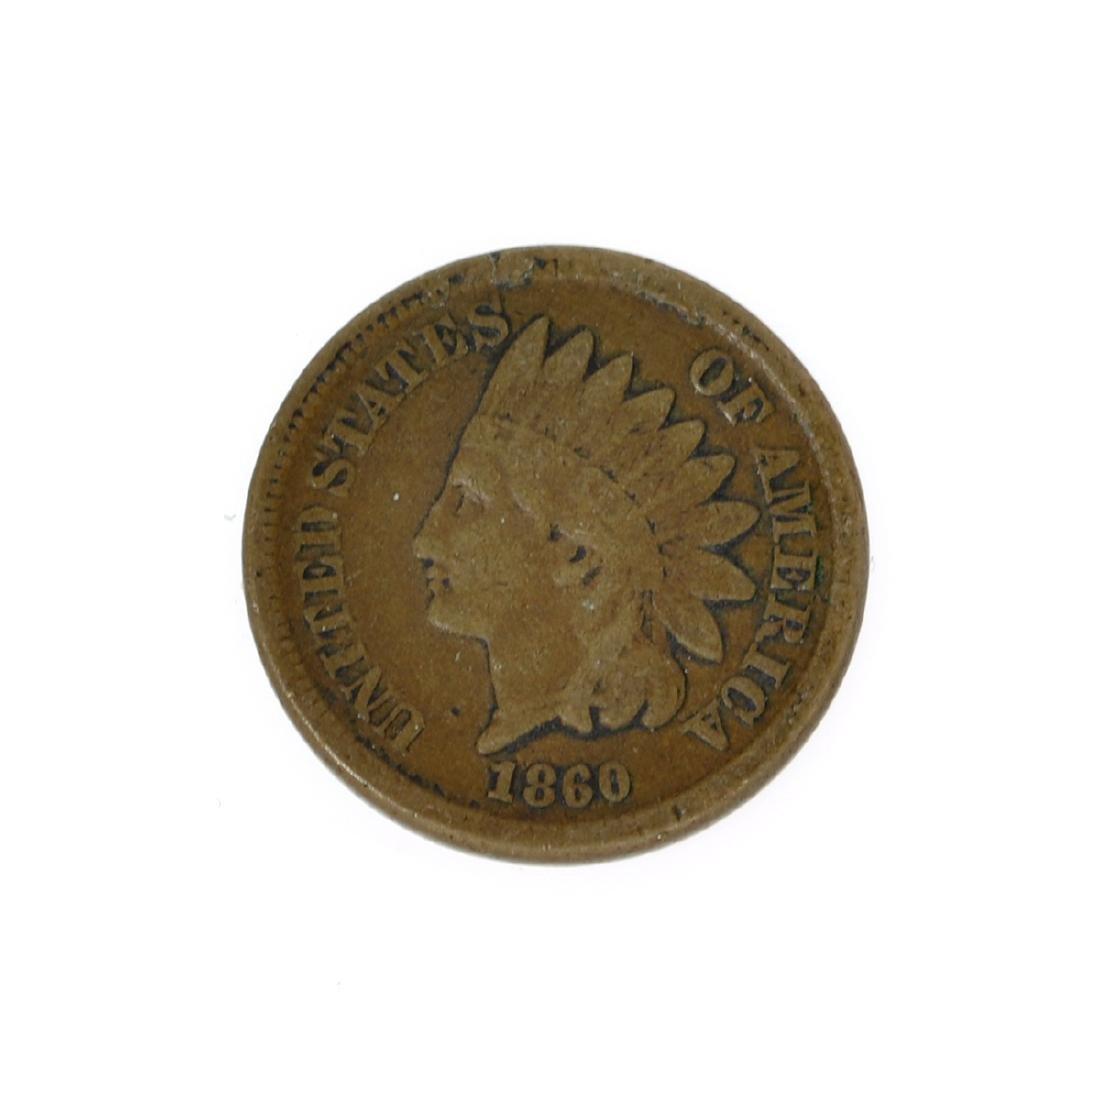 Rare 1860 Indian Cent Coin